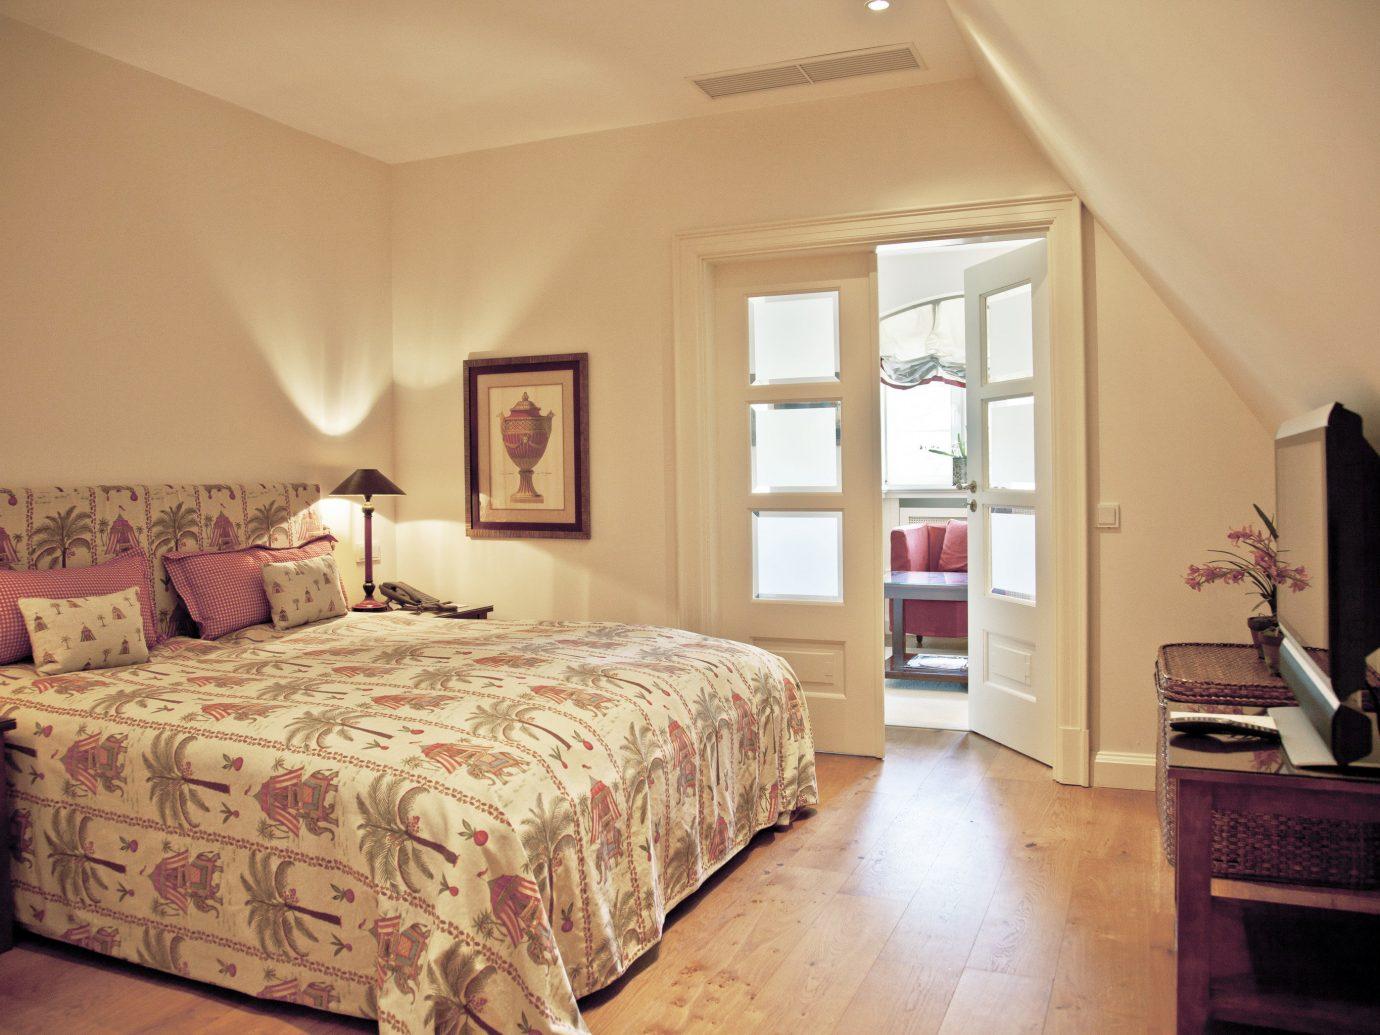 Hotels Landmarks Luxury Travel indoor wall bed floor room Bedroom ceiling interior design Suite home real estate scene furniture estate window hotel bed frame flooring lamp